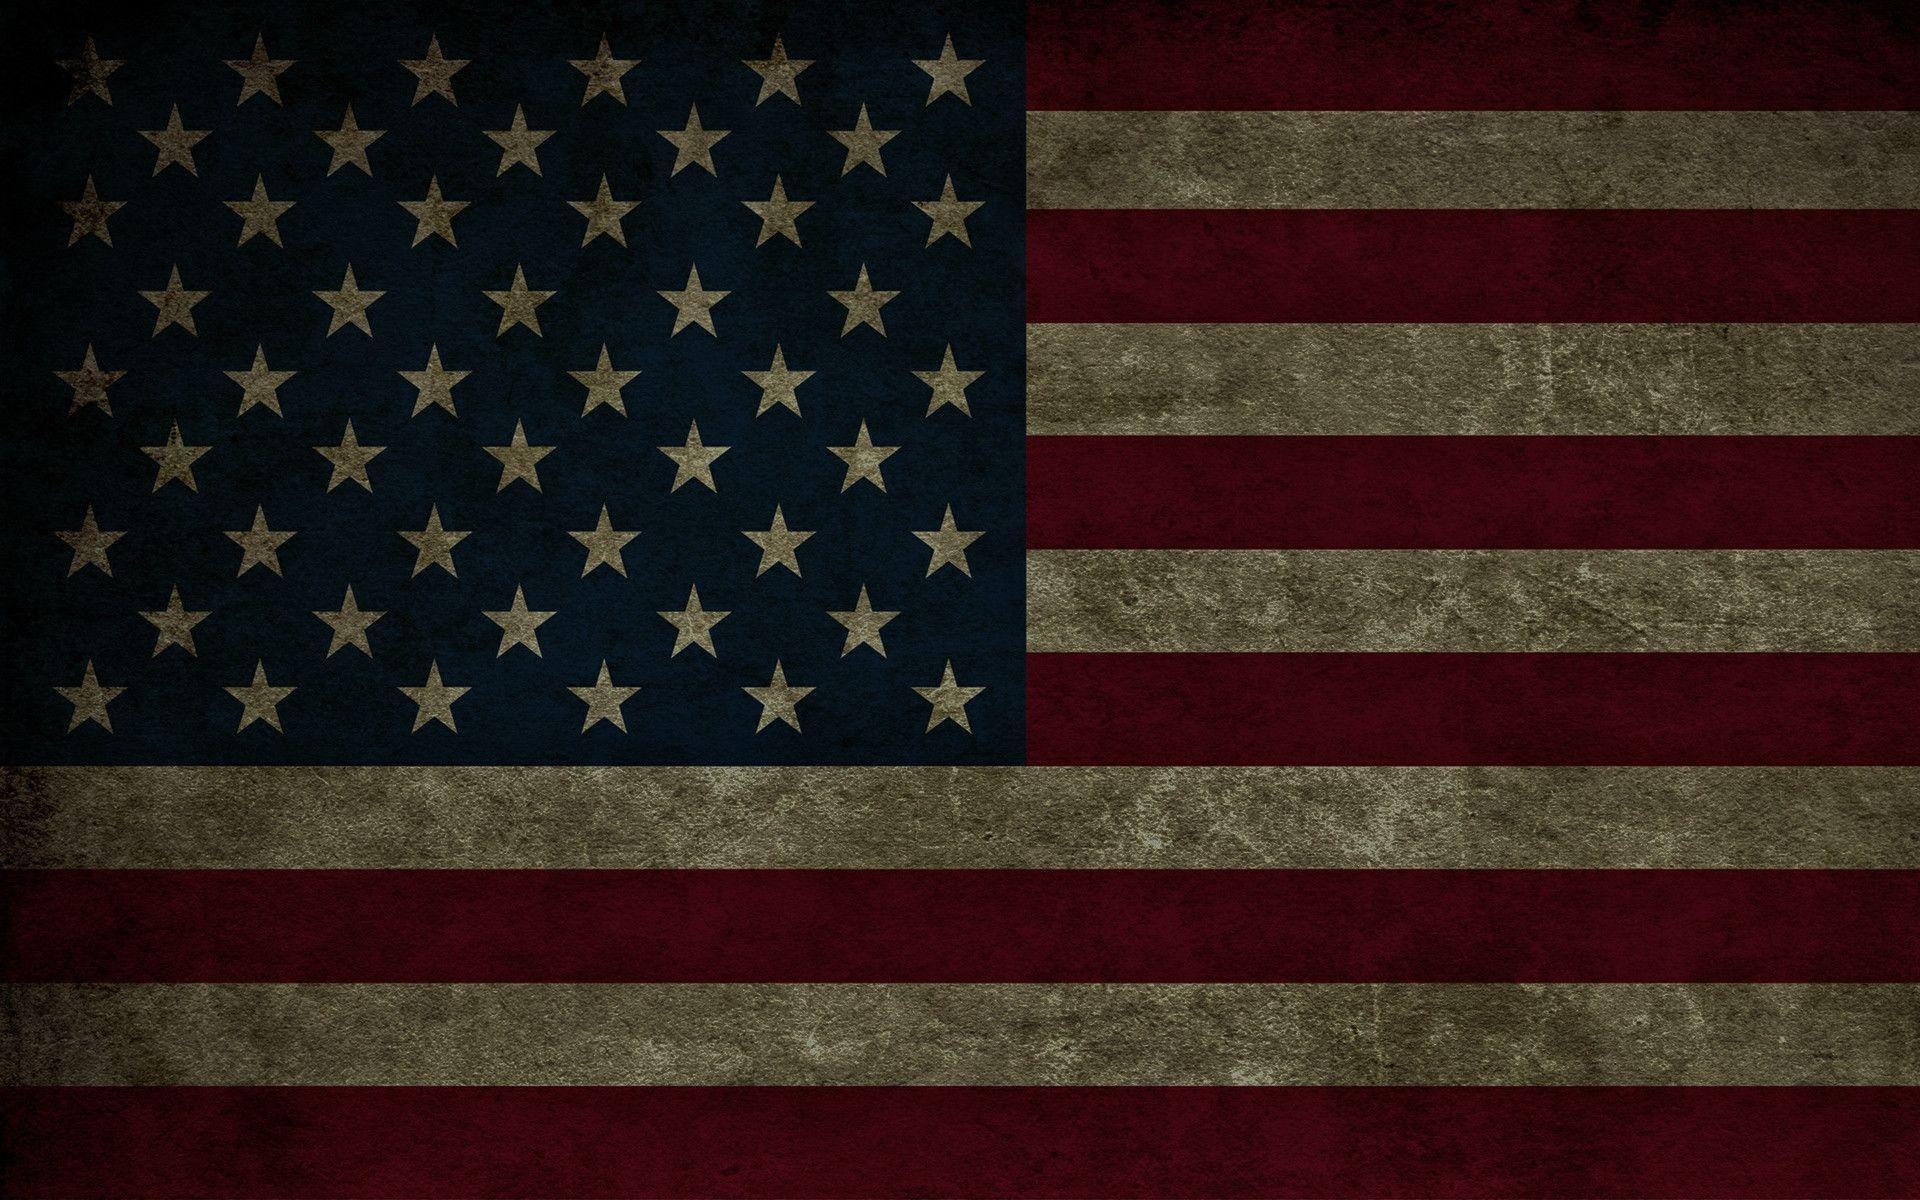 American Flag Wallpapers  Wallpaper Cave American Flag Wallpapers Wallpaper Cave